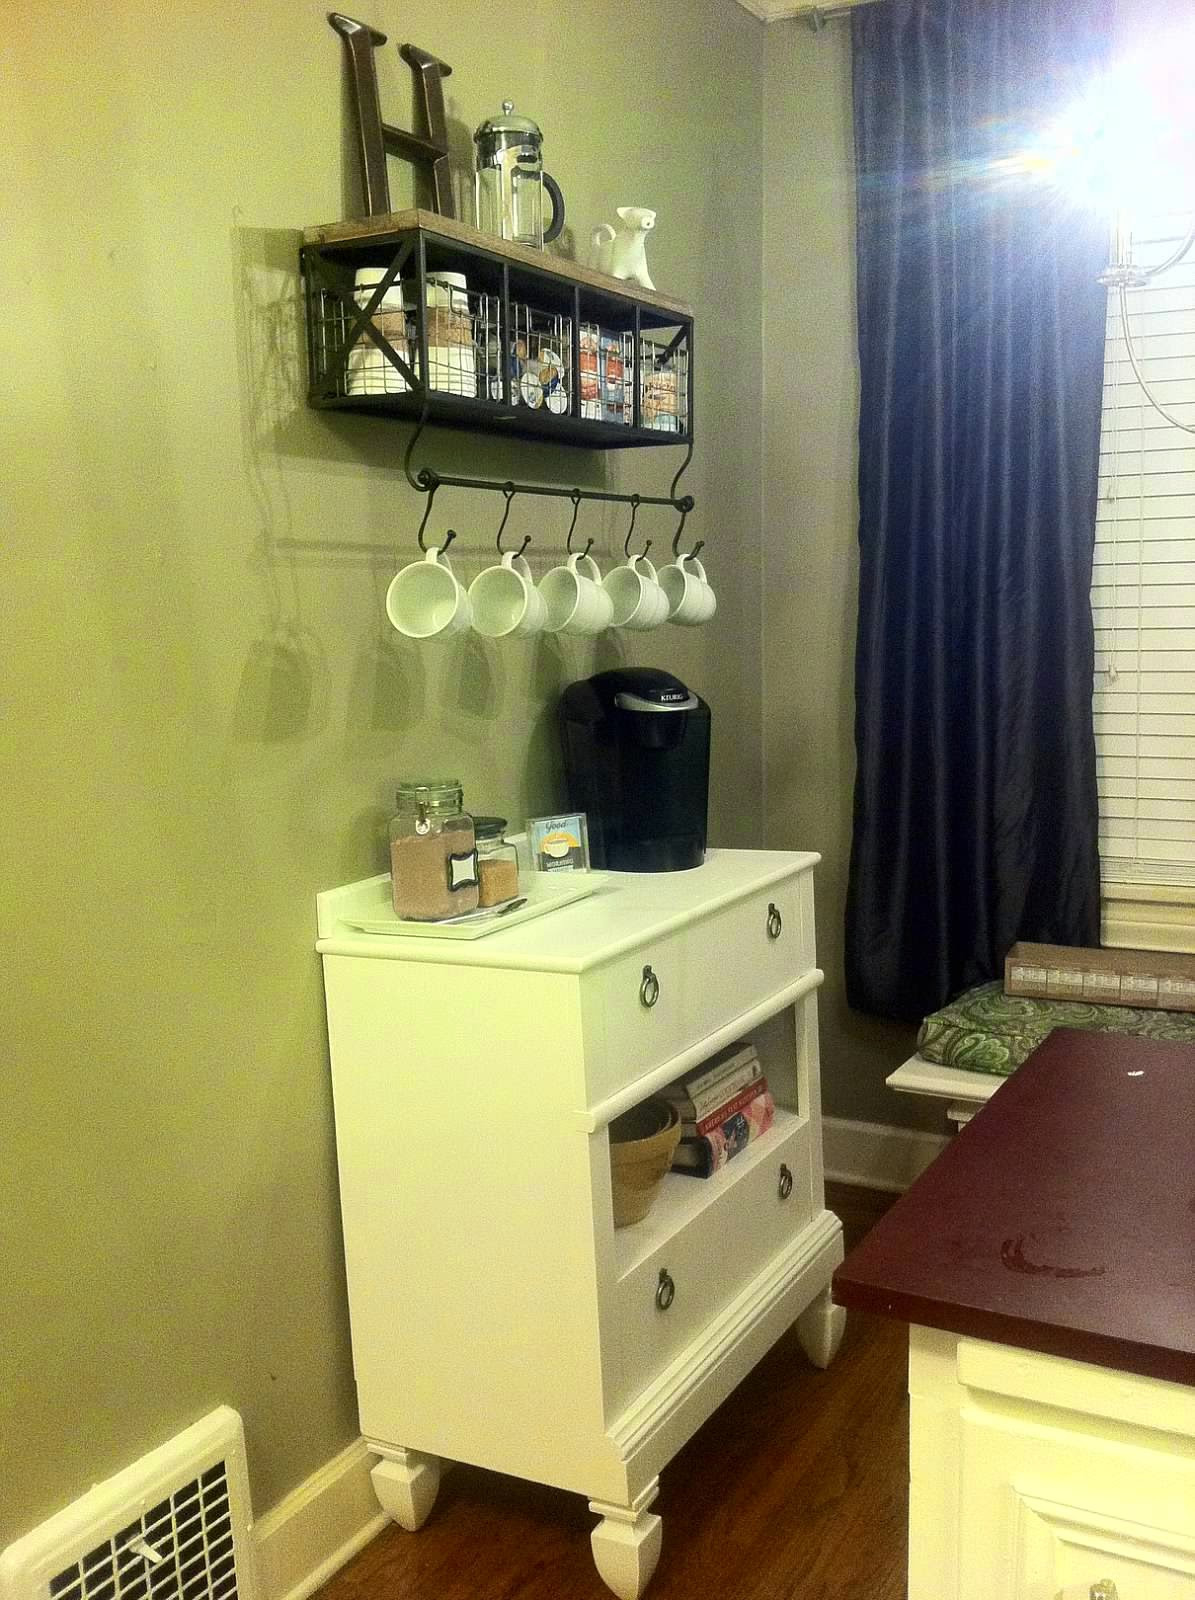 Best ideas about Coffee Kitchen Decor Walmart . Save or Pin Walmart Coffee Bar Now.